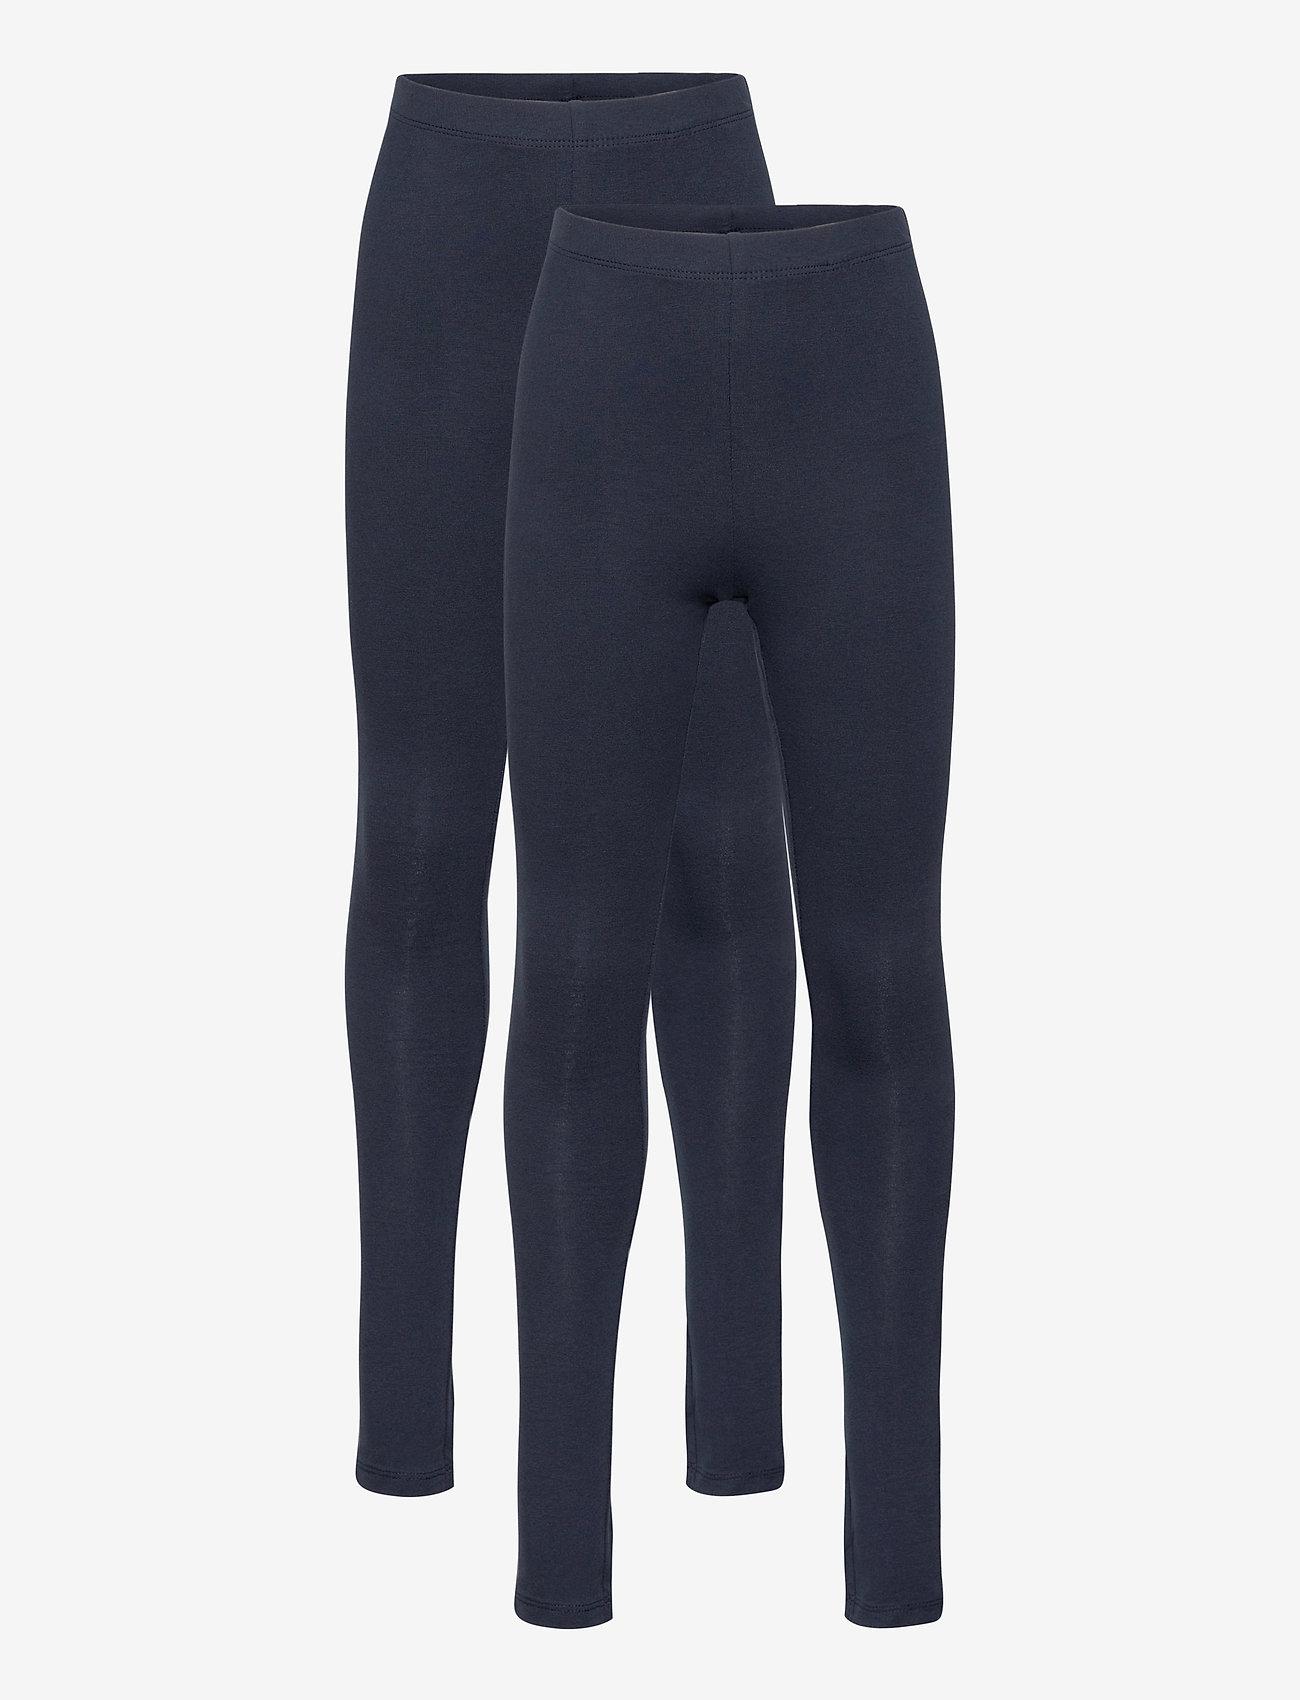 name it - NKFVIVIAN 2P LEGGING NOOS - leggings - dark sapphire - 0